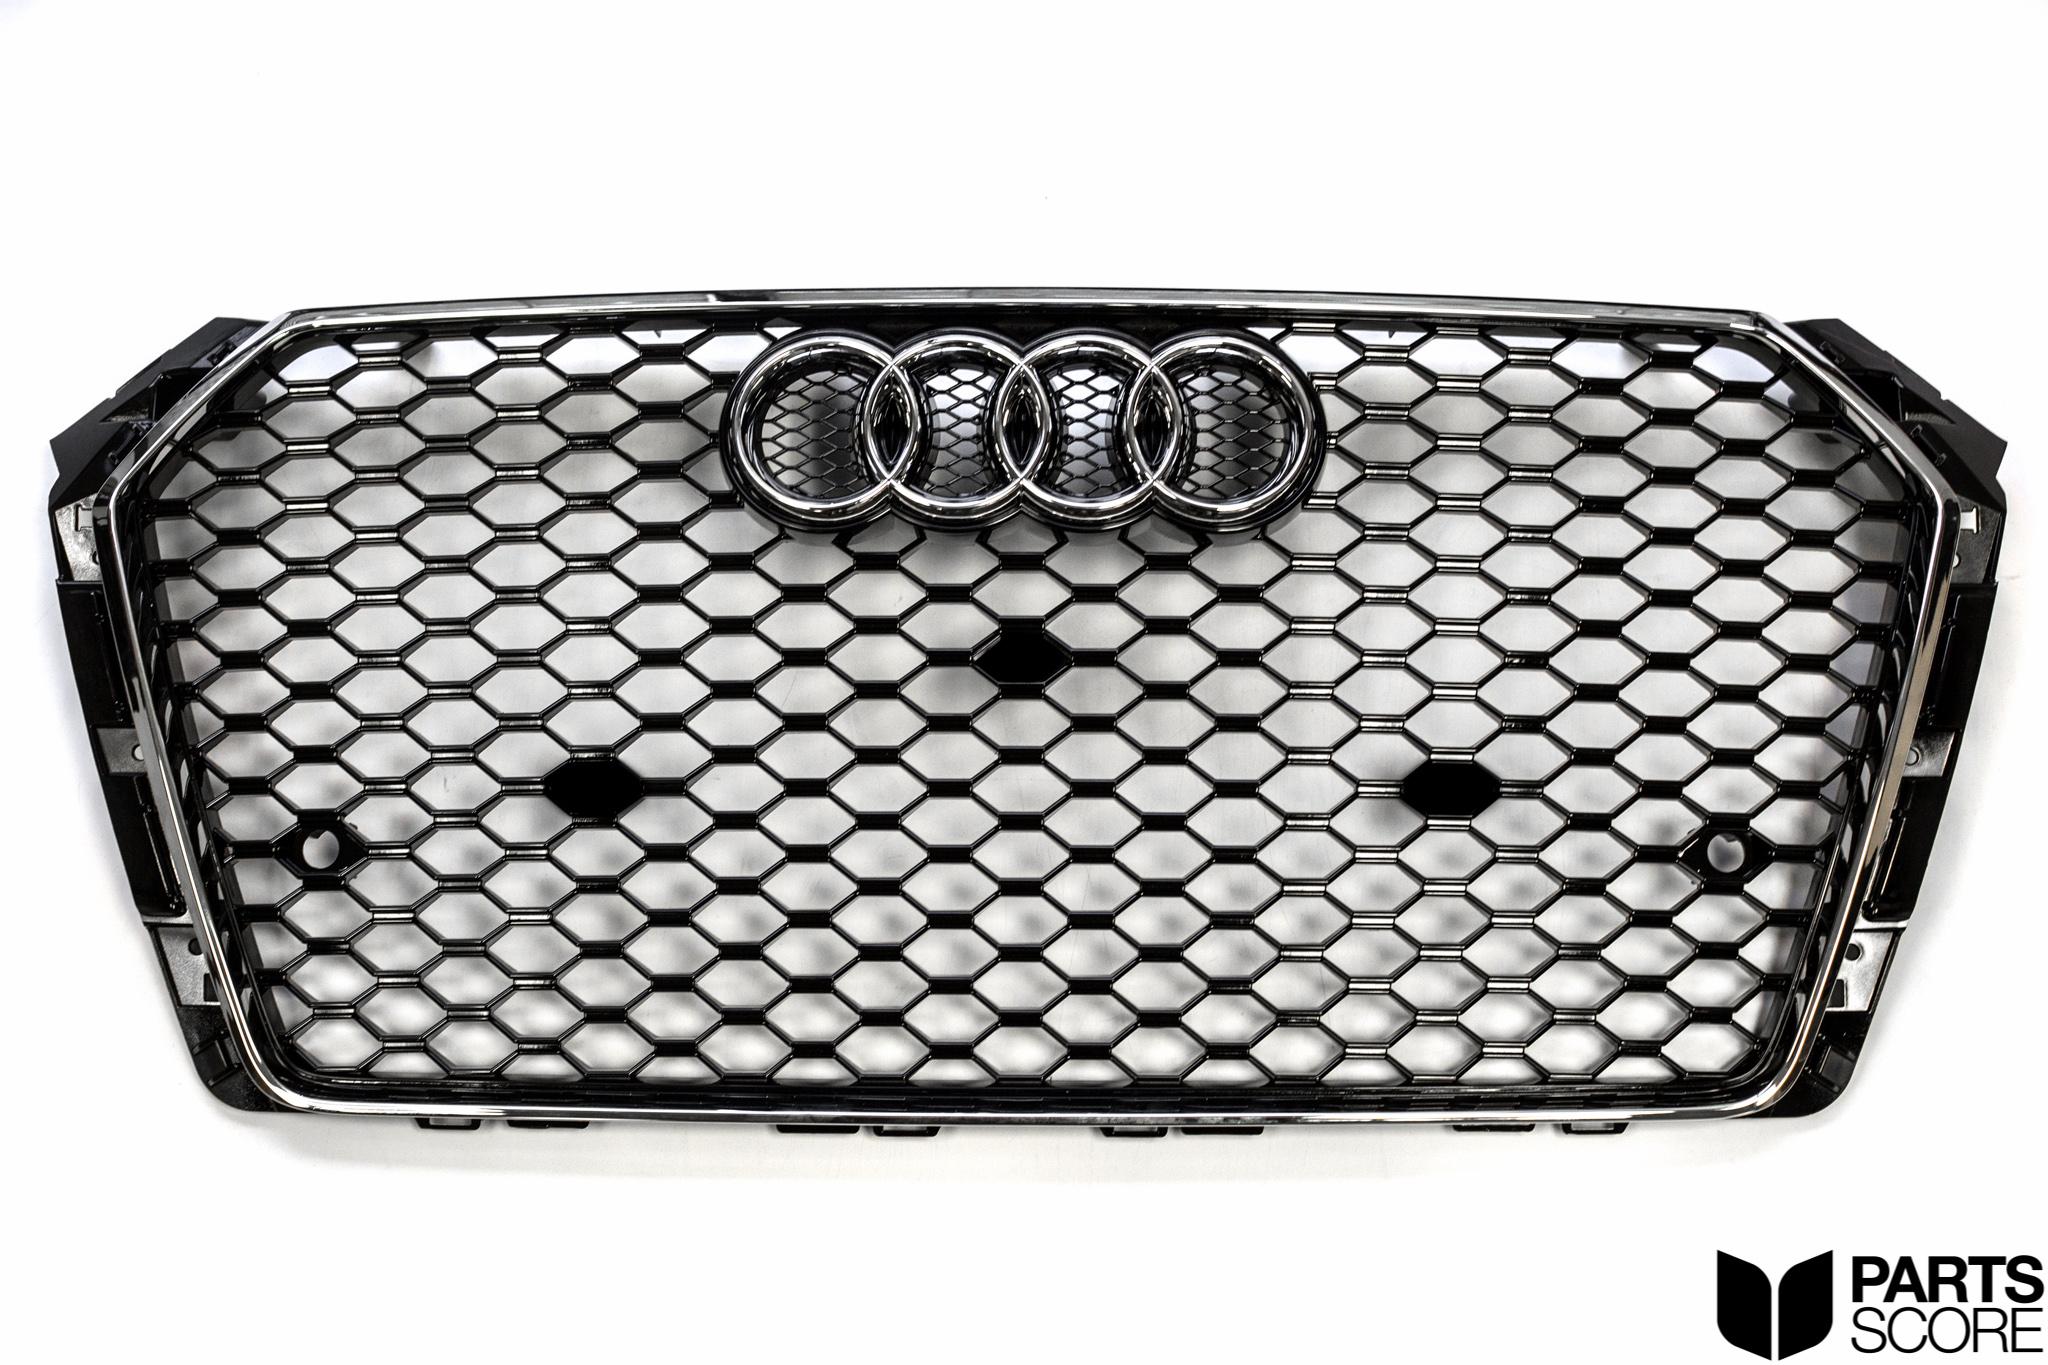 arizona, Audi, audi b9 s4, audi b9 s5, audi has kit, audi performance, audi s4, b9 a4 grill, b9 a4 rs grill, b9 a5 grill, b9 a5 rs grill, b9 audi mods, b9 h and r springs, b9 h r coilovers, b9 h&r springs, b9 modifications, b9 performance, b9 s4, b9 s4 034, b9 s4 034 motorsports, b9 s4 apr, b9 s4 awe tuning, b9 s4 carbon fiber, b9 s4 downpipe, b9 s4 exhaust, b9 s4 flash, b9 s4 flash tune, b9 s4 front lip, b9 s4 giac, b9 s4 giac tune, b9 s4 grill, b9 s4 h and r coilovers, b9 s4 h r coilovers, b9 s4 h&r coilovers, b9 s4 h&r springs, b9 s4 has kit, b9 s4 intake, b9 s4 kw coilovers, b9 s4 kw has kit, b9 s4 kwv1, b9 s4 kwv2, b9 s4 kwv3, b9 s4 lip, b9 s4 milltek, b9 s4 modification, b9 s4 mods, b9 s4 navigation, b9 s4 ohlins, b9 s4 ohlins road and track, b9 s4 painted reflectors, b9 s4 performance, b9 s4 performance mods, b9 s4 power, b9 s4 spacers, b9 s4 spoiler, b9 s4 springs, b9 s4 tune, b9 s5, b9 s5 apr, b9 s5 awe tuning, b9 s5 carbon fiber, b9 s5 downpipe, b9 s5 exhaust, b9 s5 front lip, b9 s5 giac, b9 s5 grill, b9 s5 h&r springs, b9 s5 has kit, b9 s5 intake, b9 s5 kw has kit, b9 s5 milltek, b9 s5 mods, b9 s5 painted reflectors, b9 s5 performance, b9 s5 power, b9 s5 springs, giac flash, giac tune, giactuned, glacier white, h and r coilovers b9, has kit, height adjustable spring kit, kw coilovers b9, magma red, mesh, mesh grill, parts score, rs grill, rs4 grill, rs4 s4 grill, s4 b9 cts turbo, scottsdale